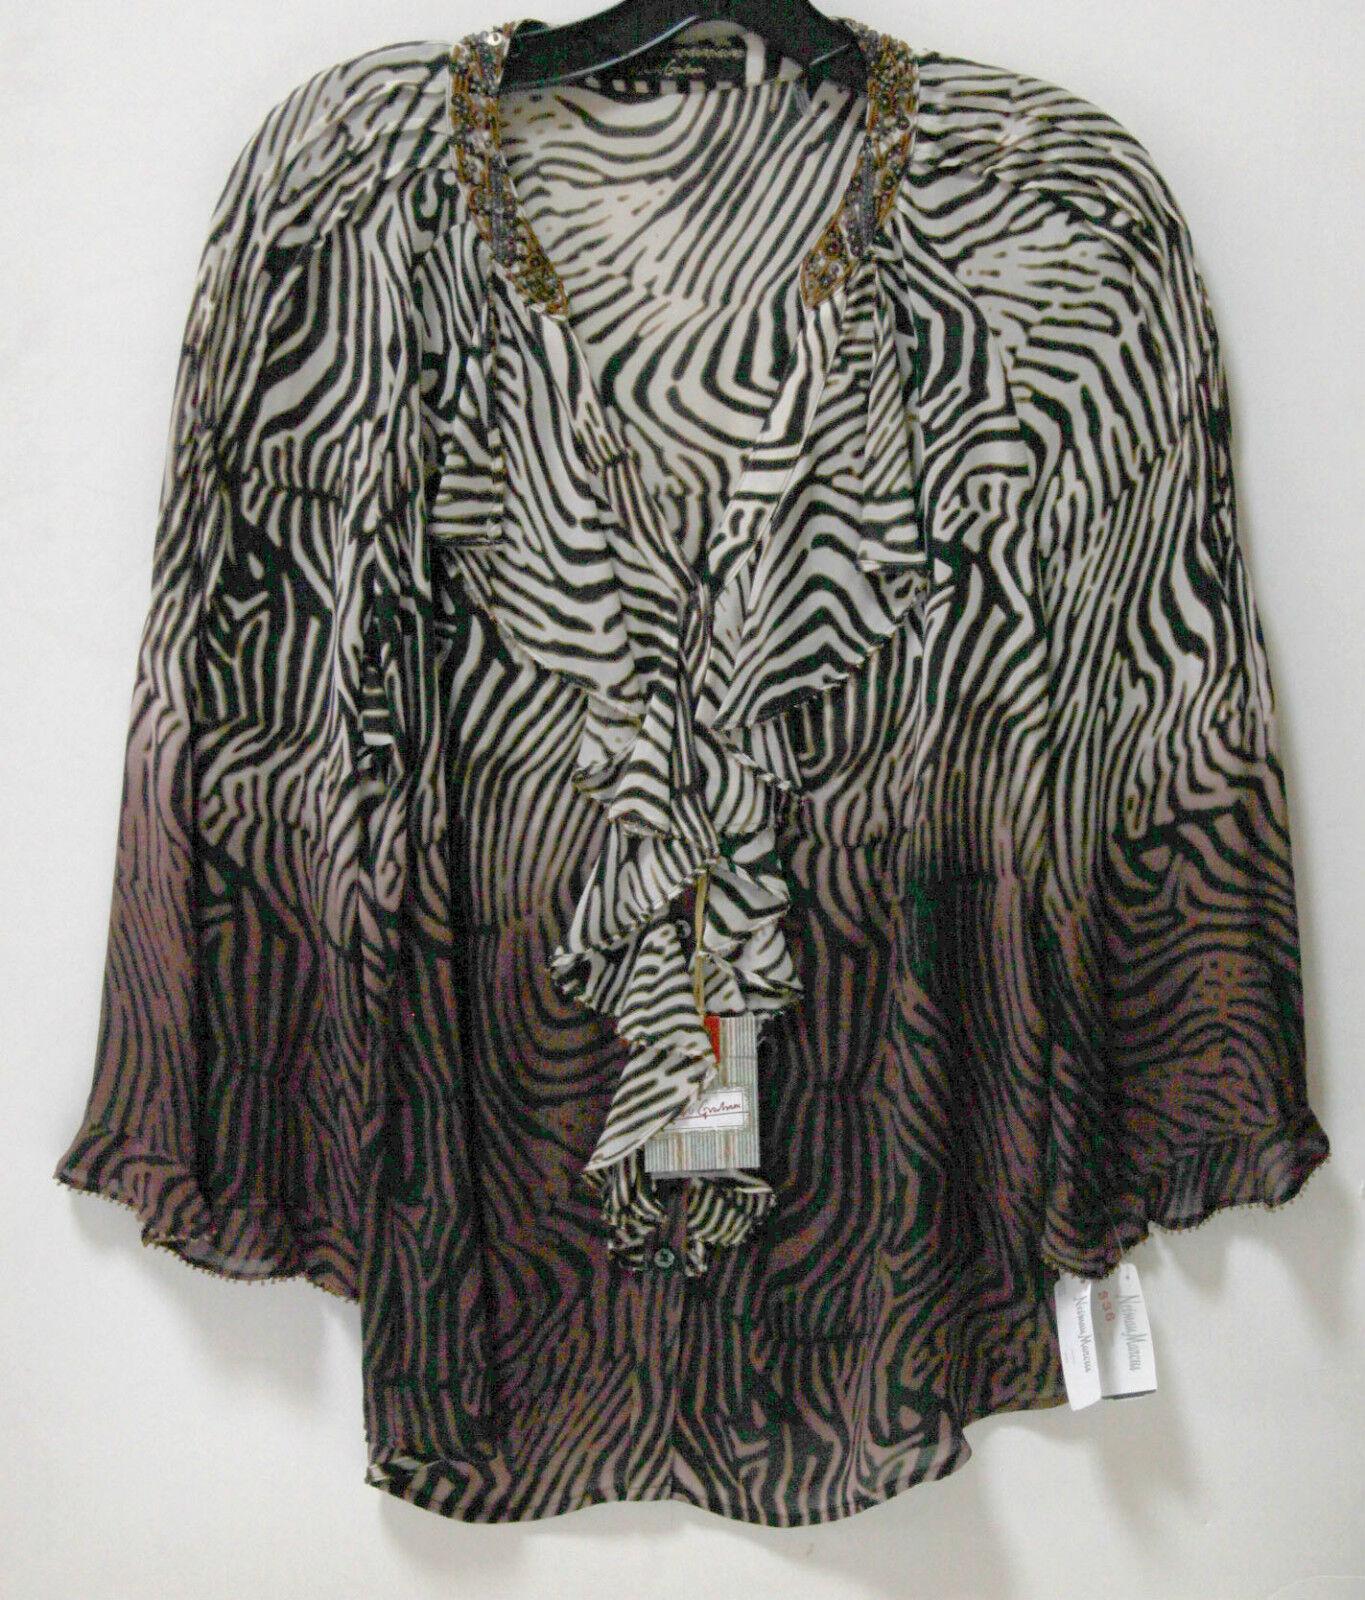 NWT Robert Graham Neiman Marcus Ladies M Zebra Print Ruffle Blouse FS